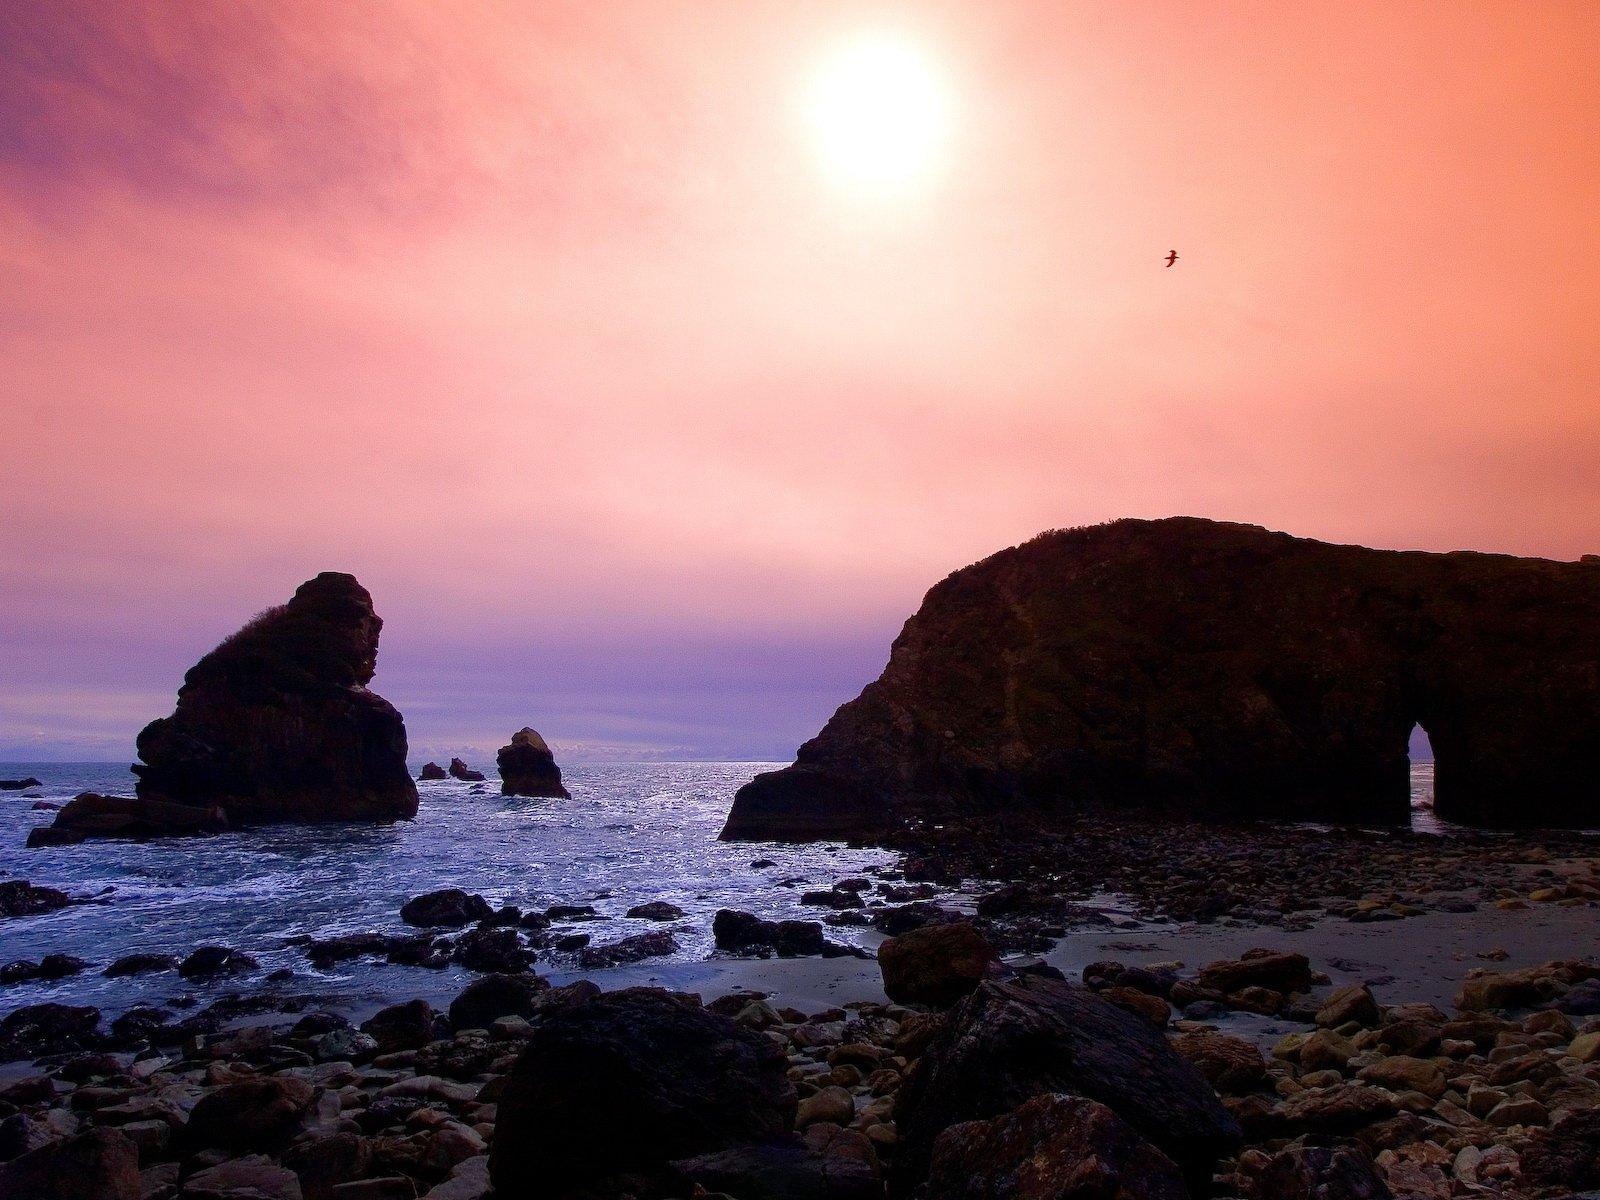 Earth - Sunrise  Photography Landscape Skyline Ocean Sea Beach Coastline Shore Rock Bird Wallpaper